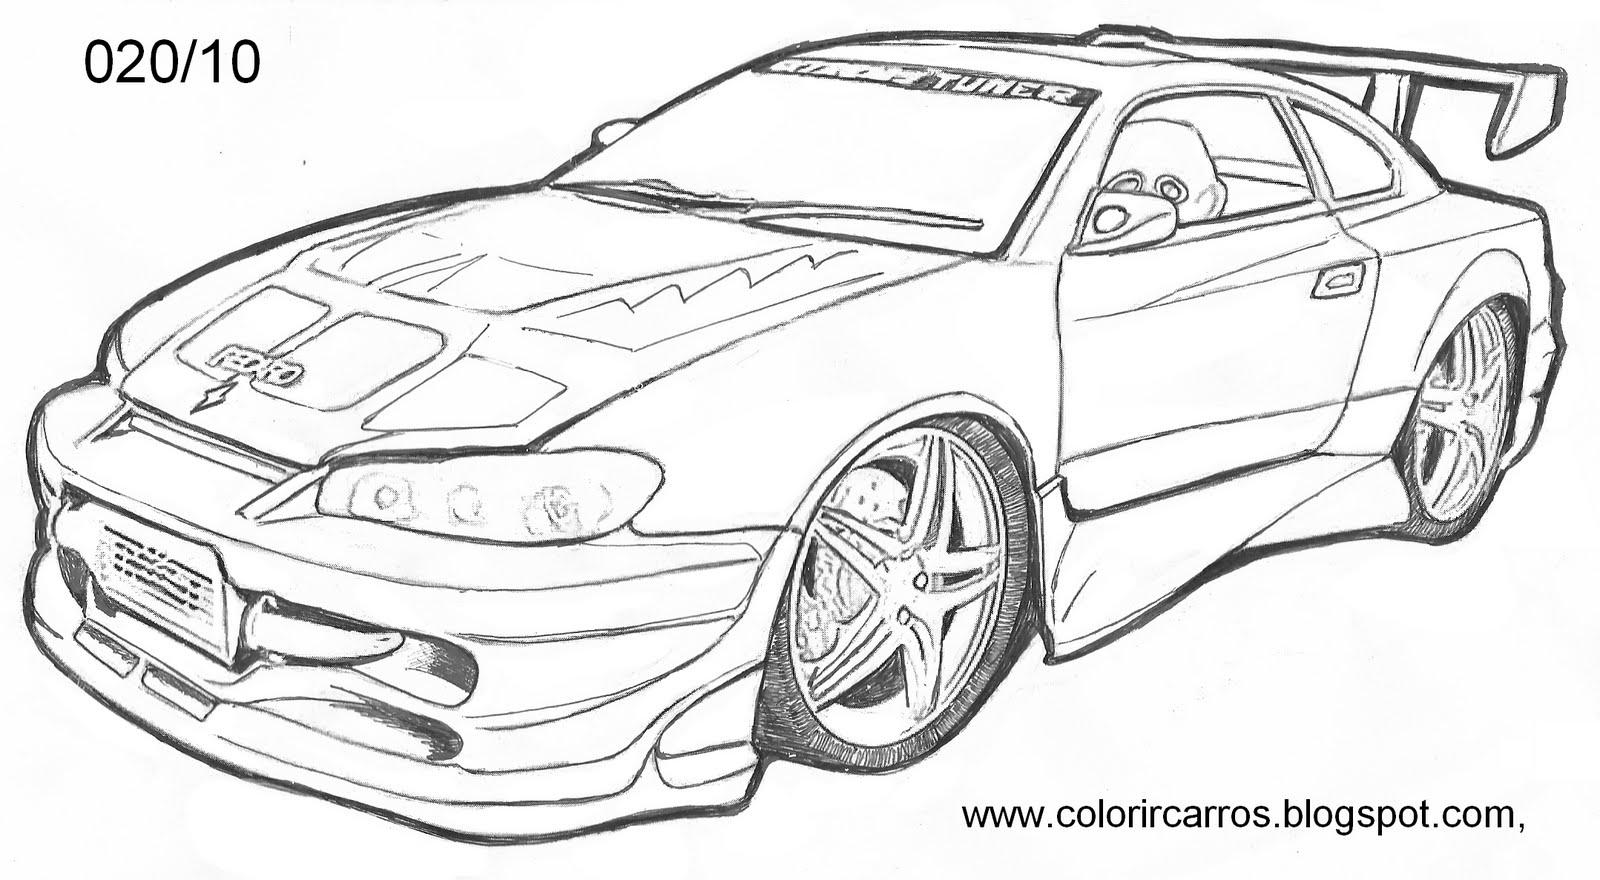 Colorindo E Desenhando Carro Para Colorir 4